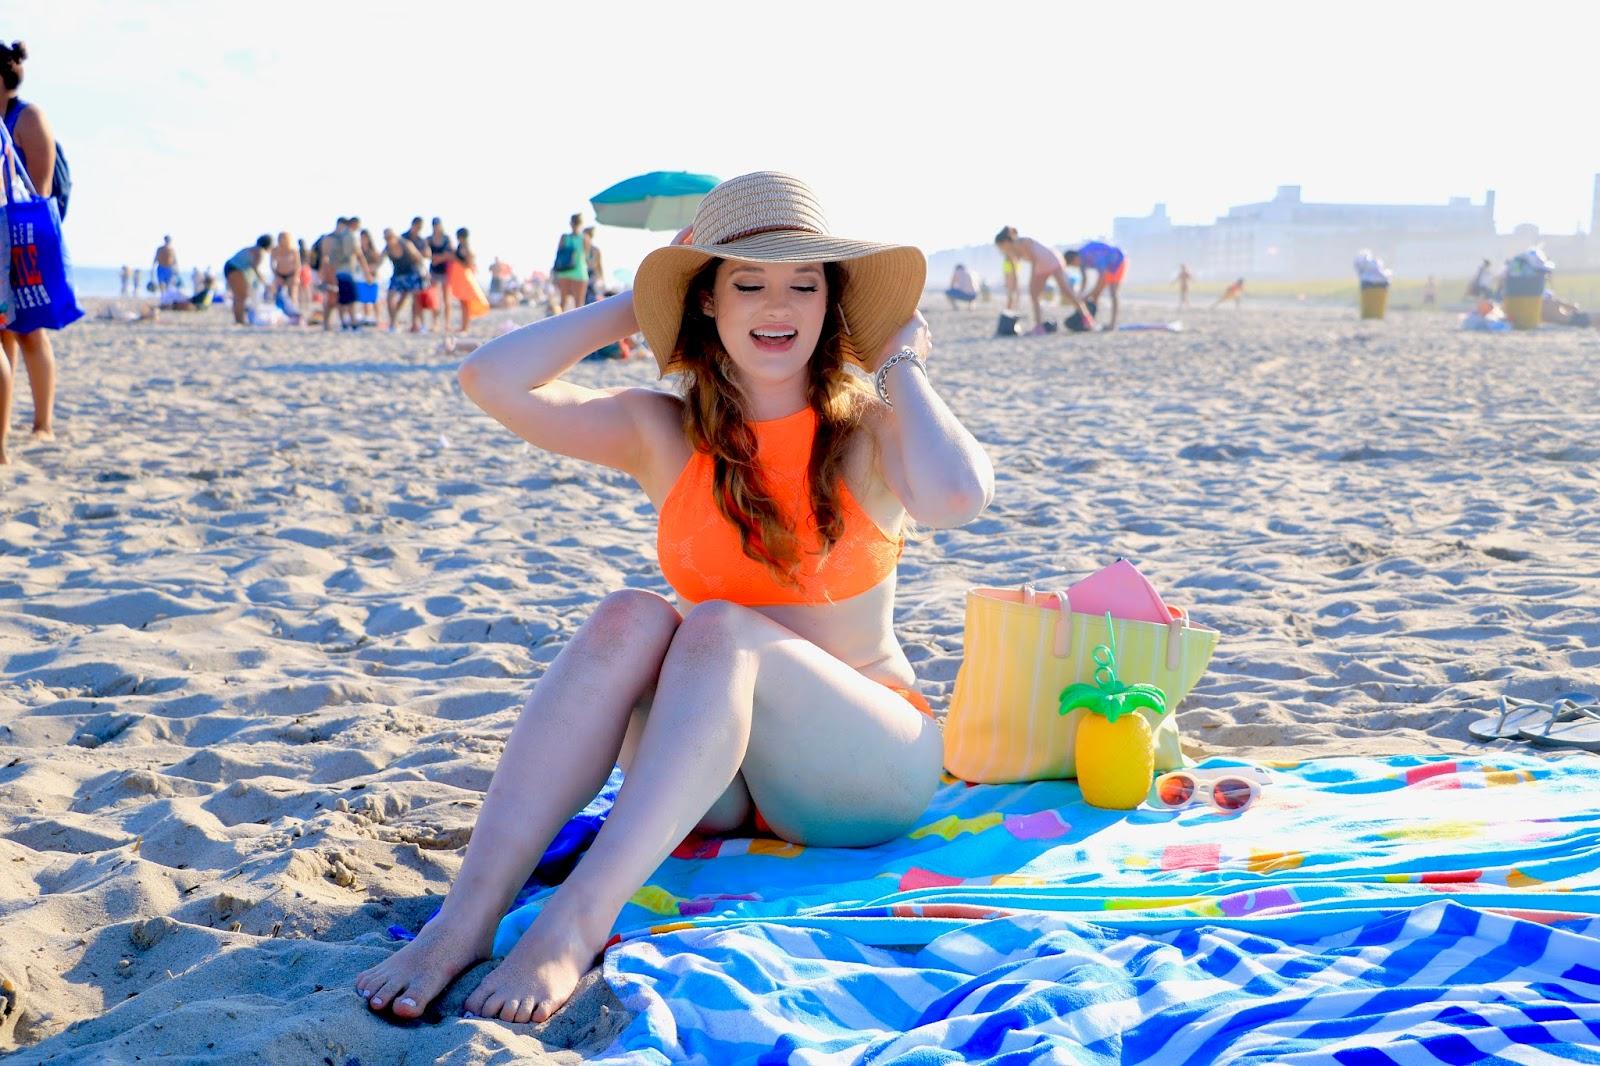 Fashion blogger Kathleen Harper on the beach